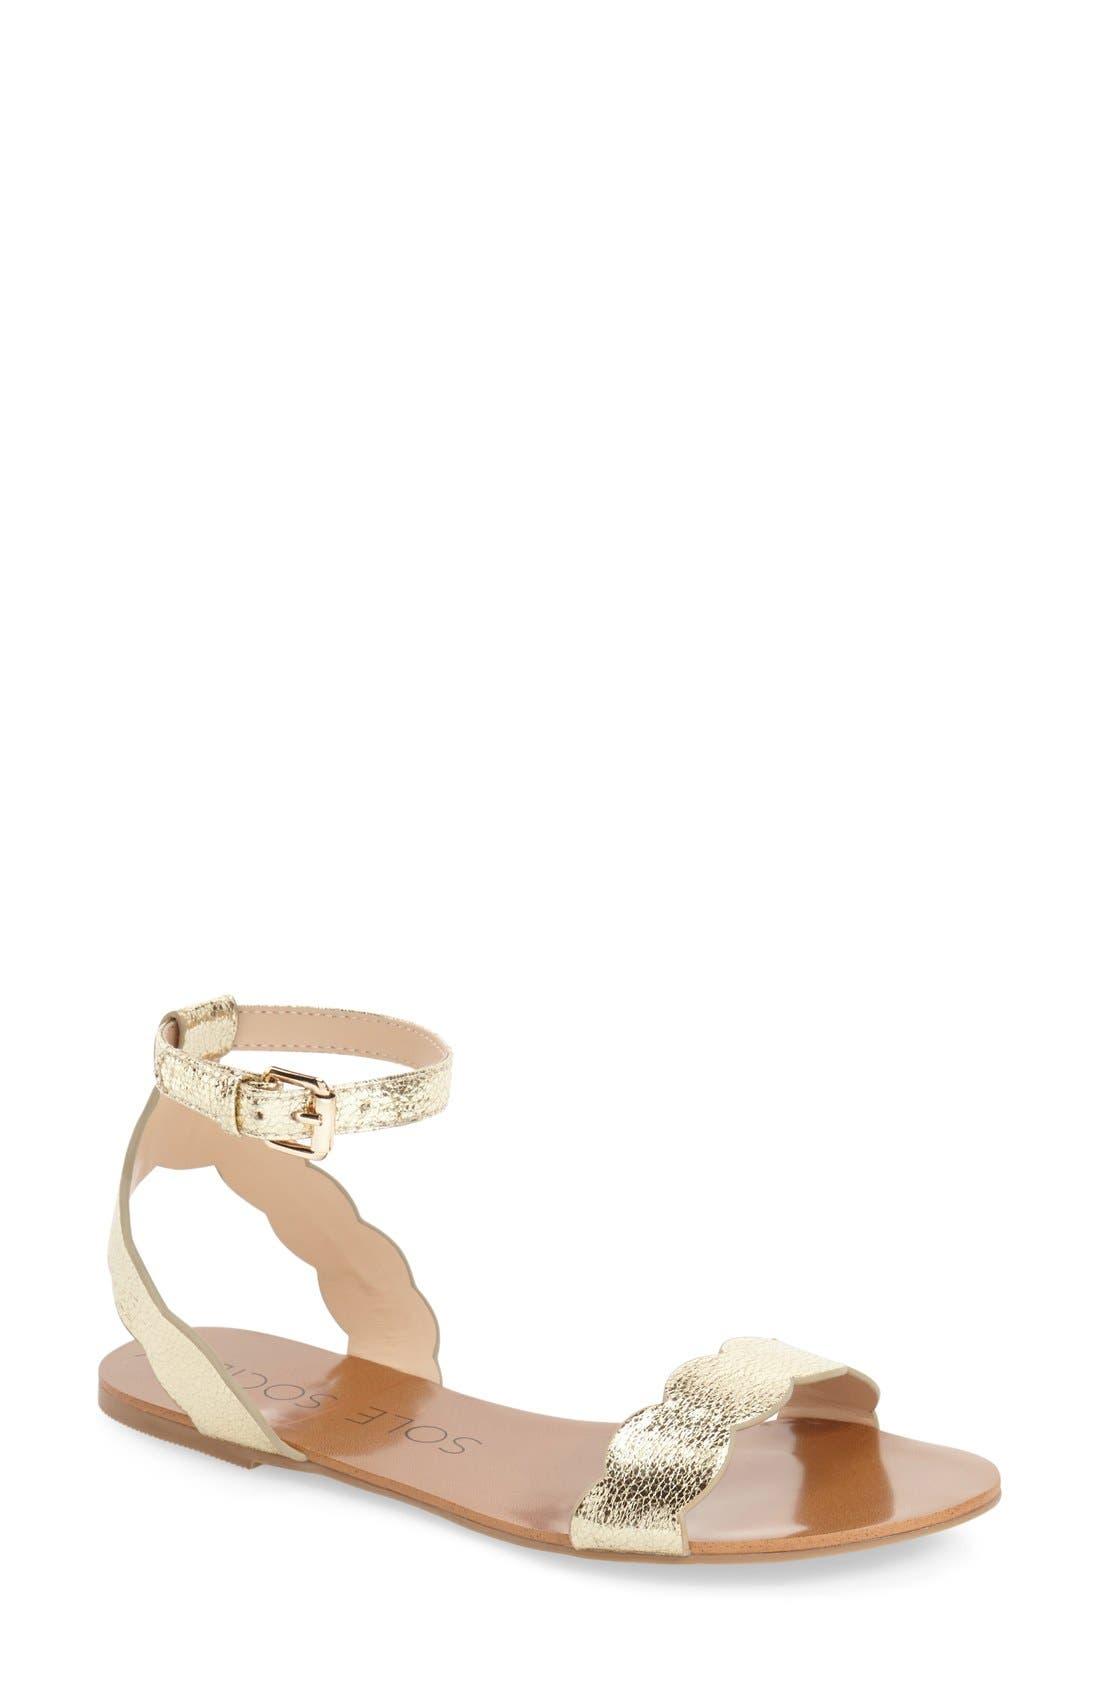 'Odette' Scalloped Ankle Strap Flat Sandal,                             Main thumbnail 7, color,